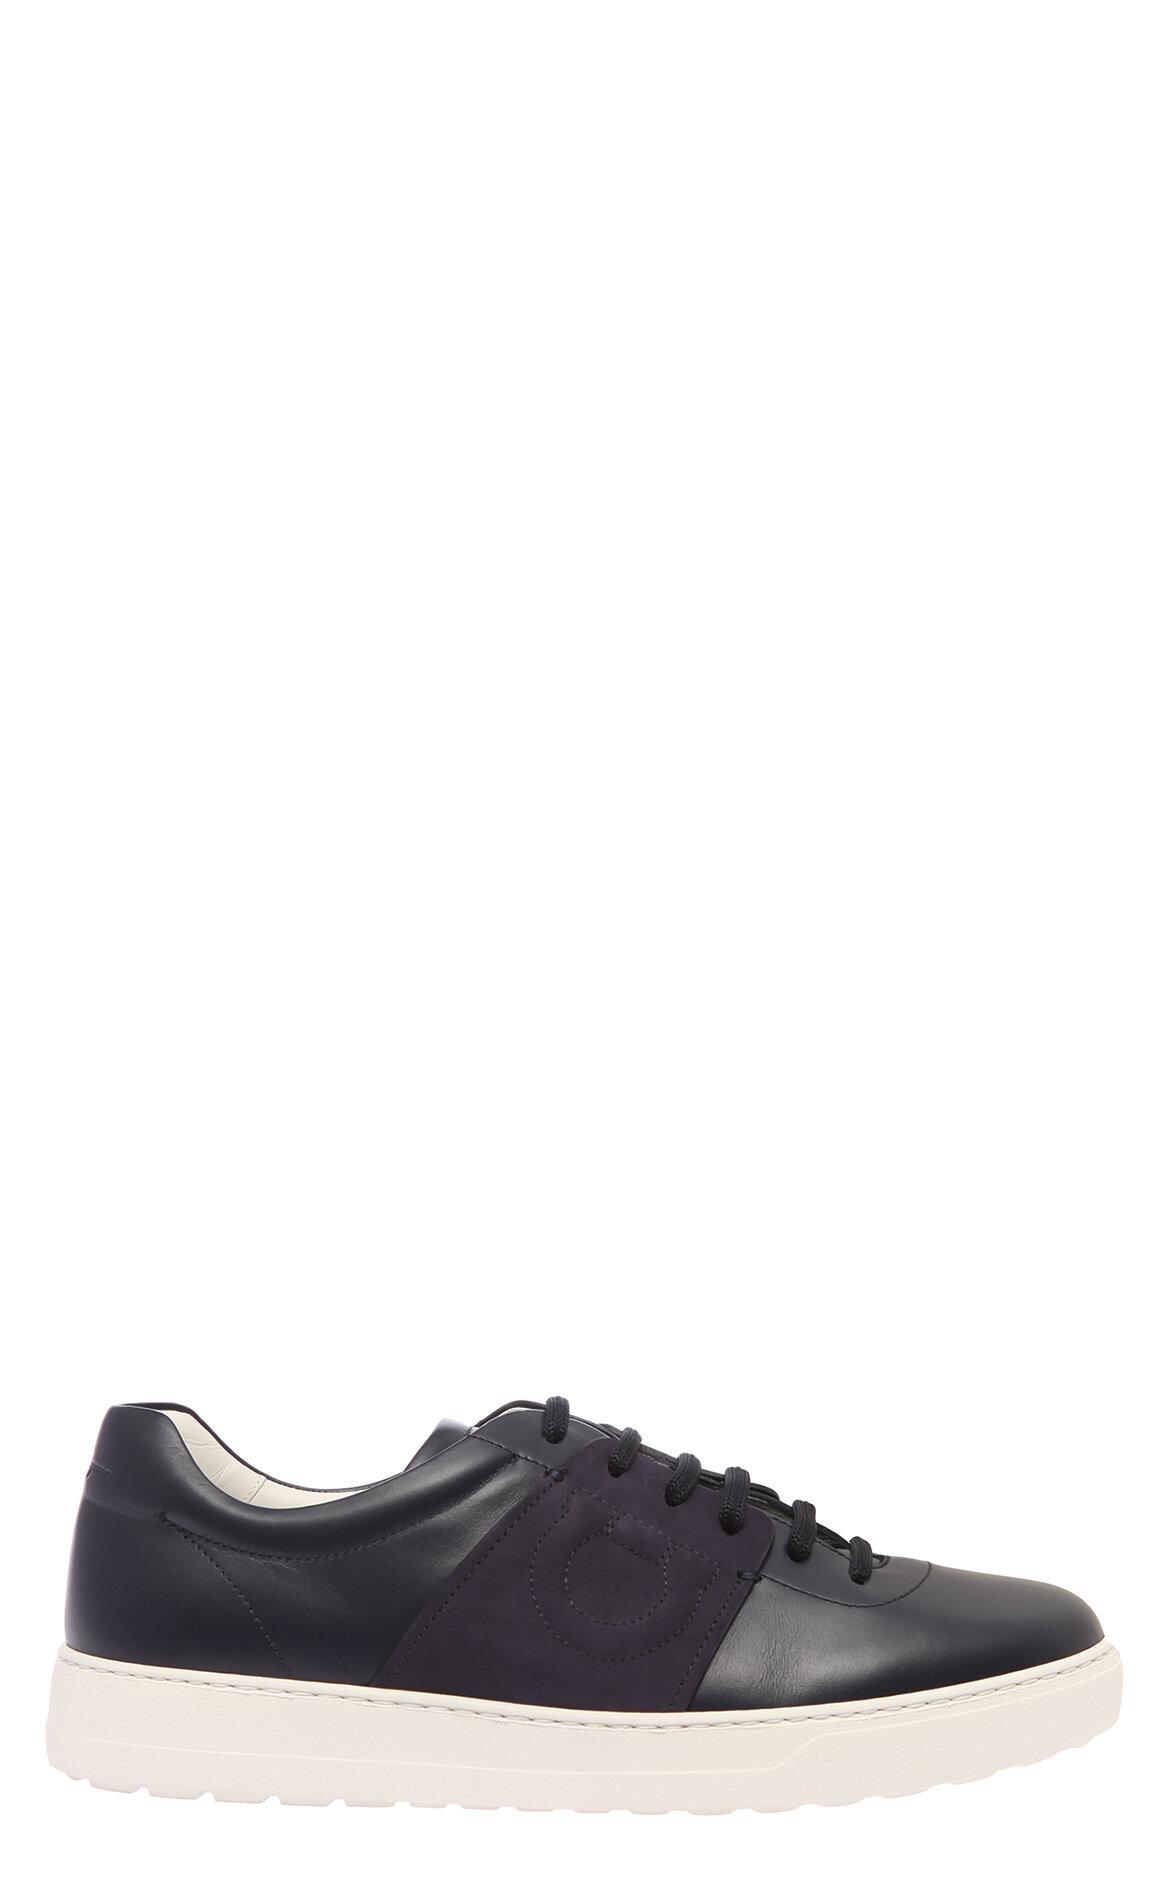 Salvatore Ferragamo-Salvatore Ferragamo Sneakers